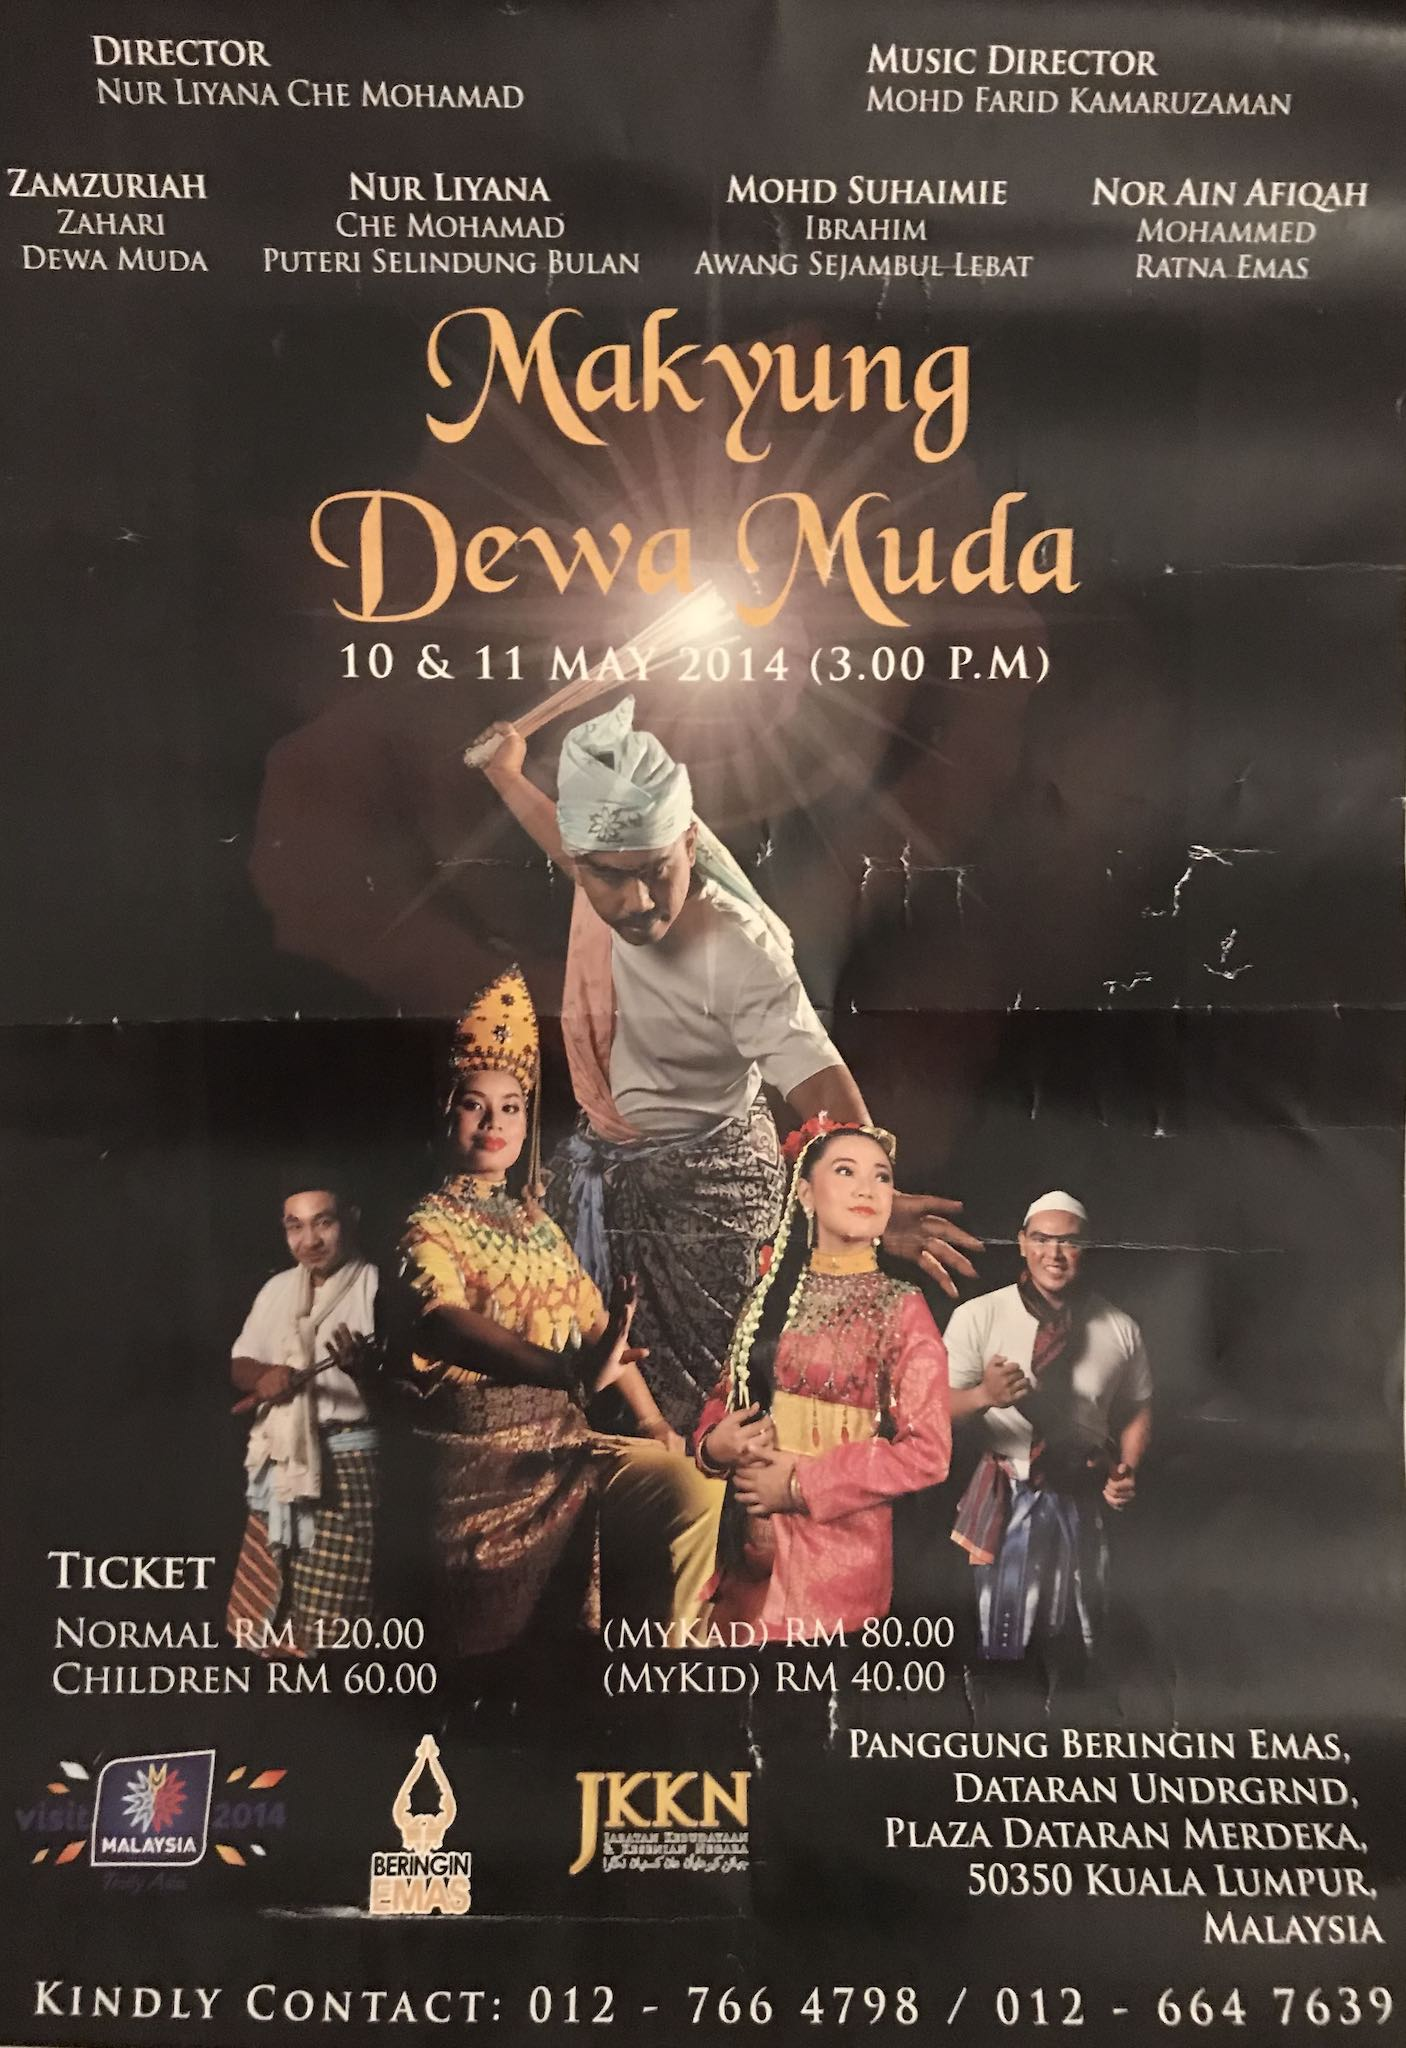 2014 Makyung Dewa Muda cover